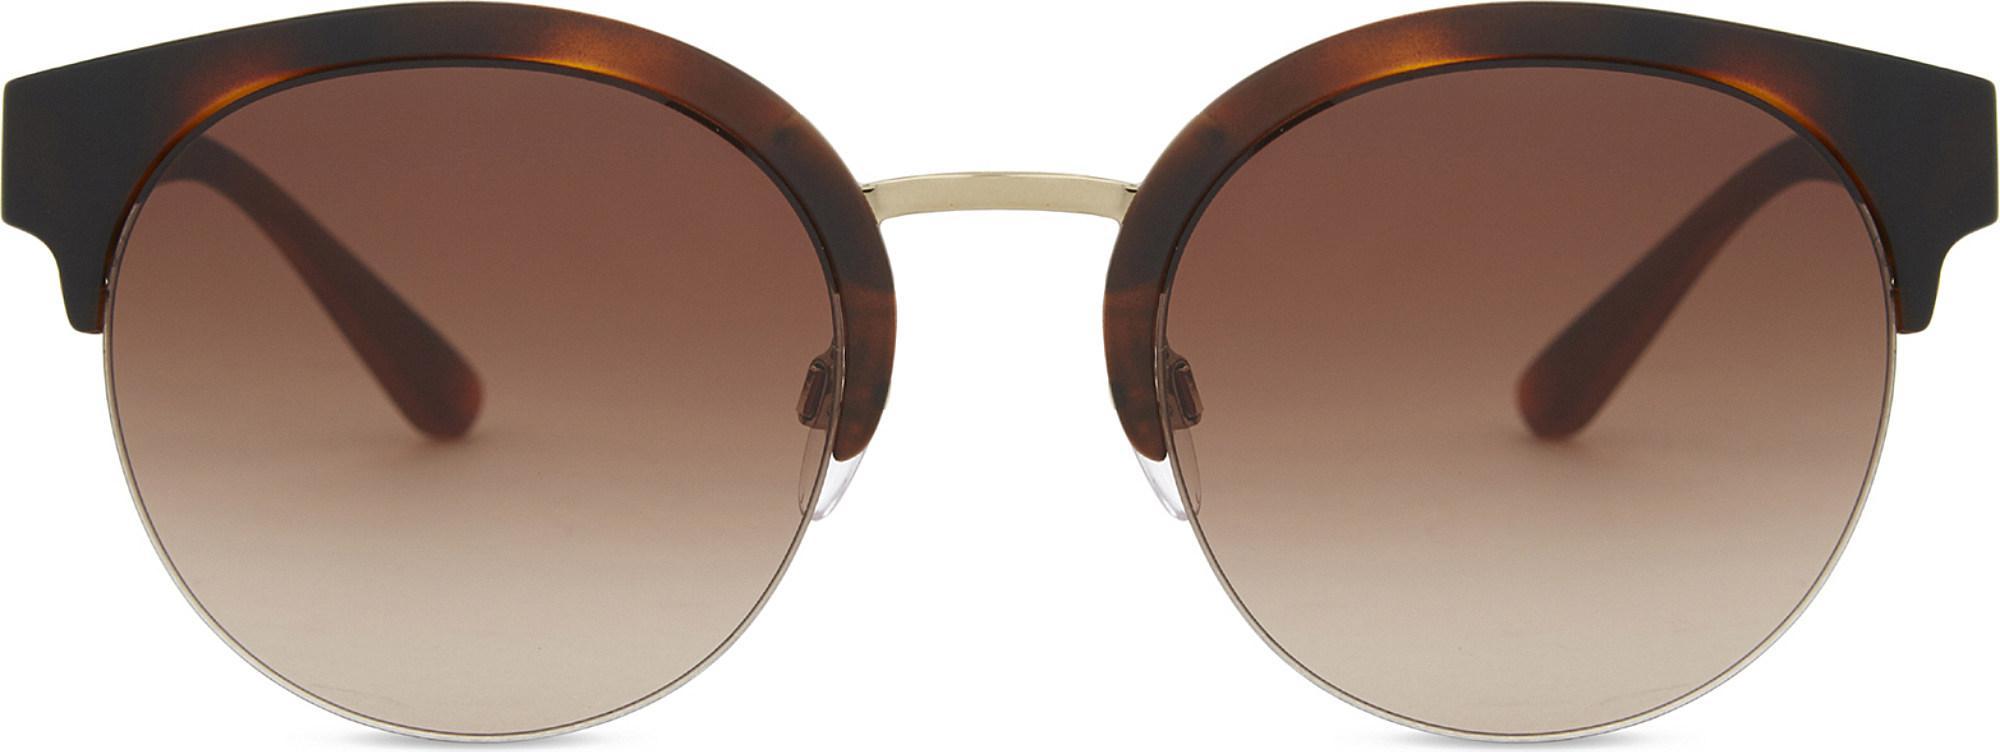 39e7623a242b9 Lyst - Burberry Be4241 Check Round Half-frame Sunglasses in Metallic